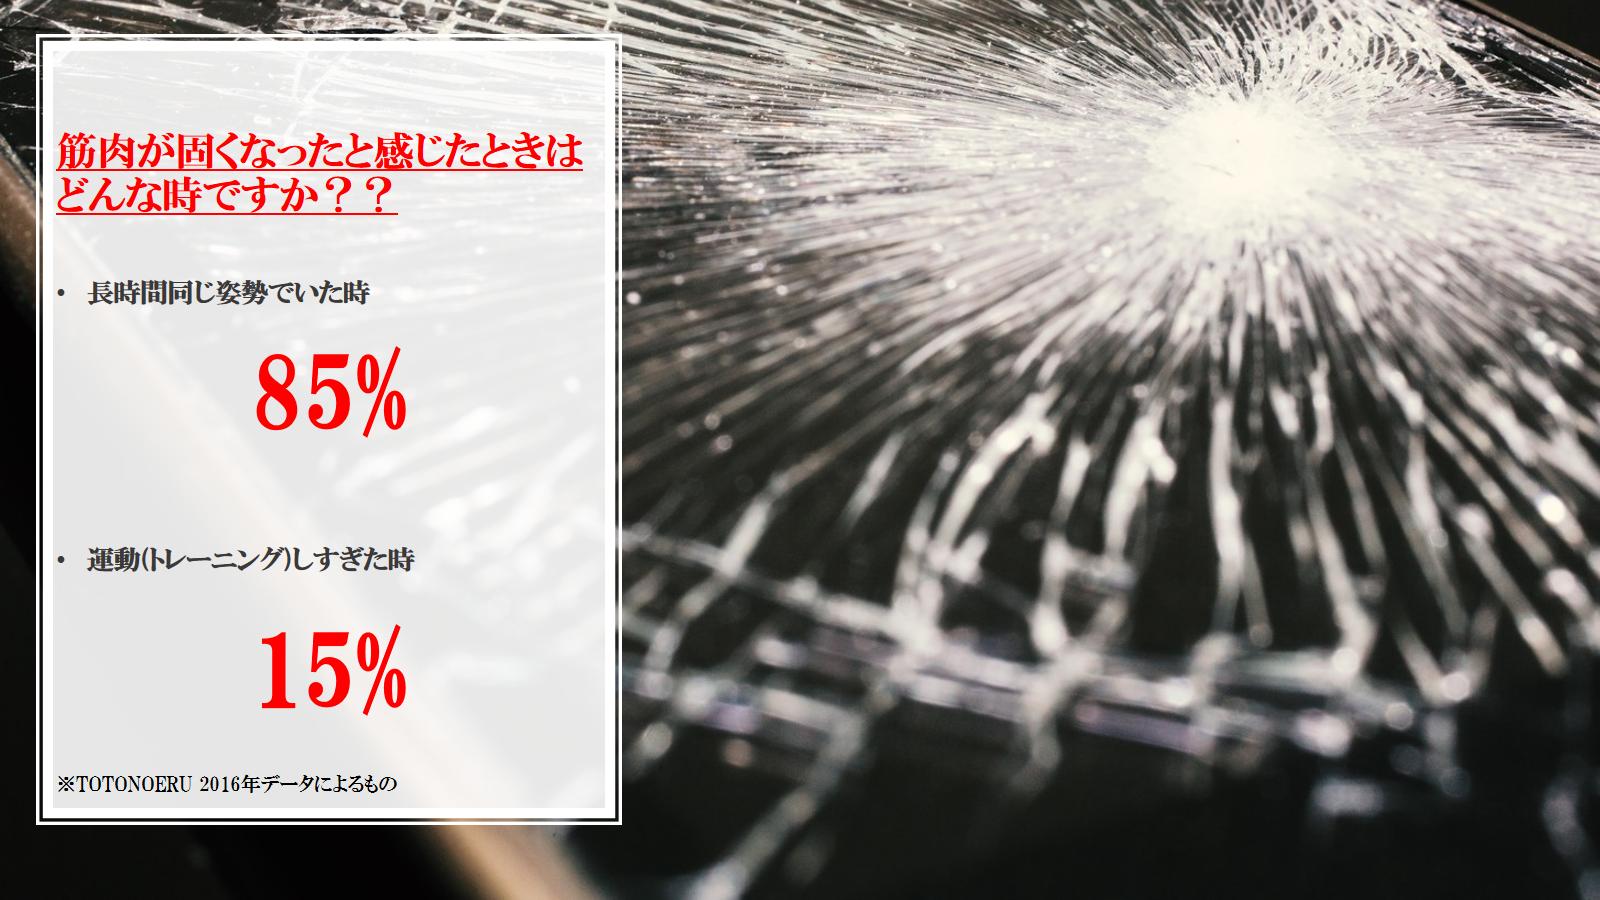 %e3%82%b9%e3%82%af%e3%83%aa%e3%83%bc%e3%83%b3%e3%82%b7%e3%83%a7%e3%83%83%e3%83%88-18